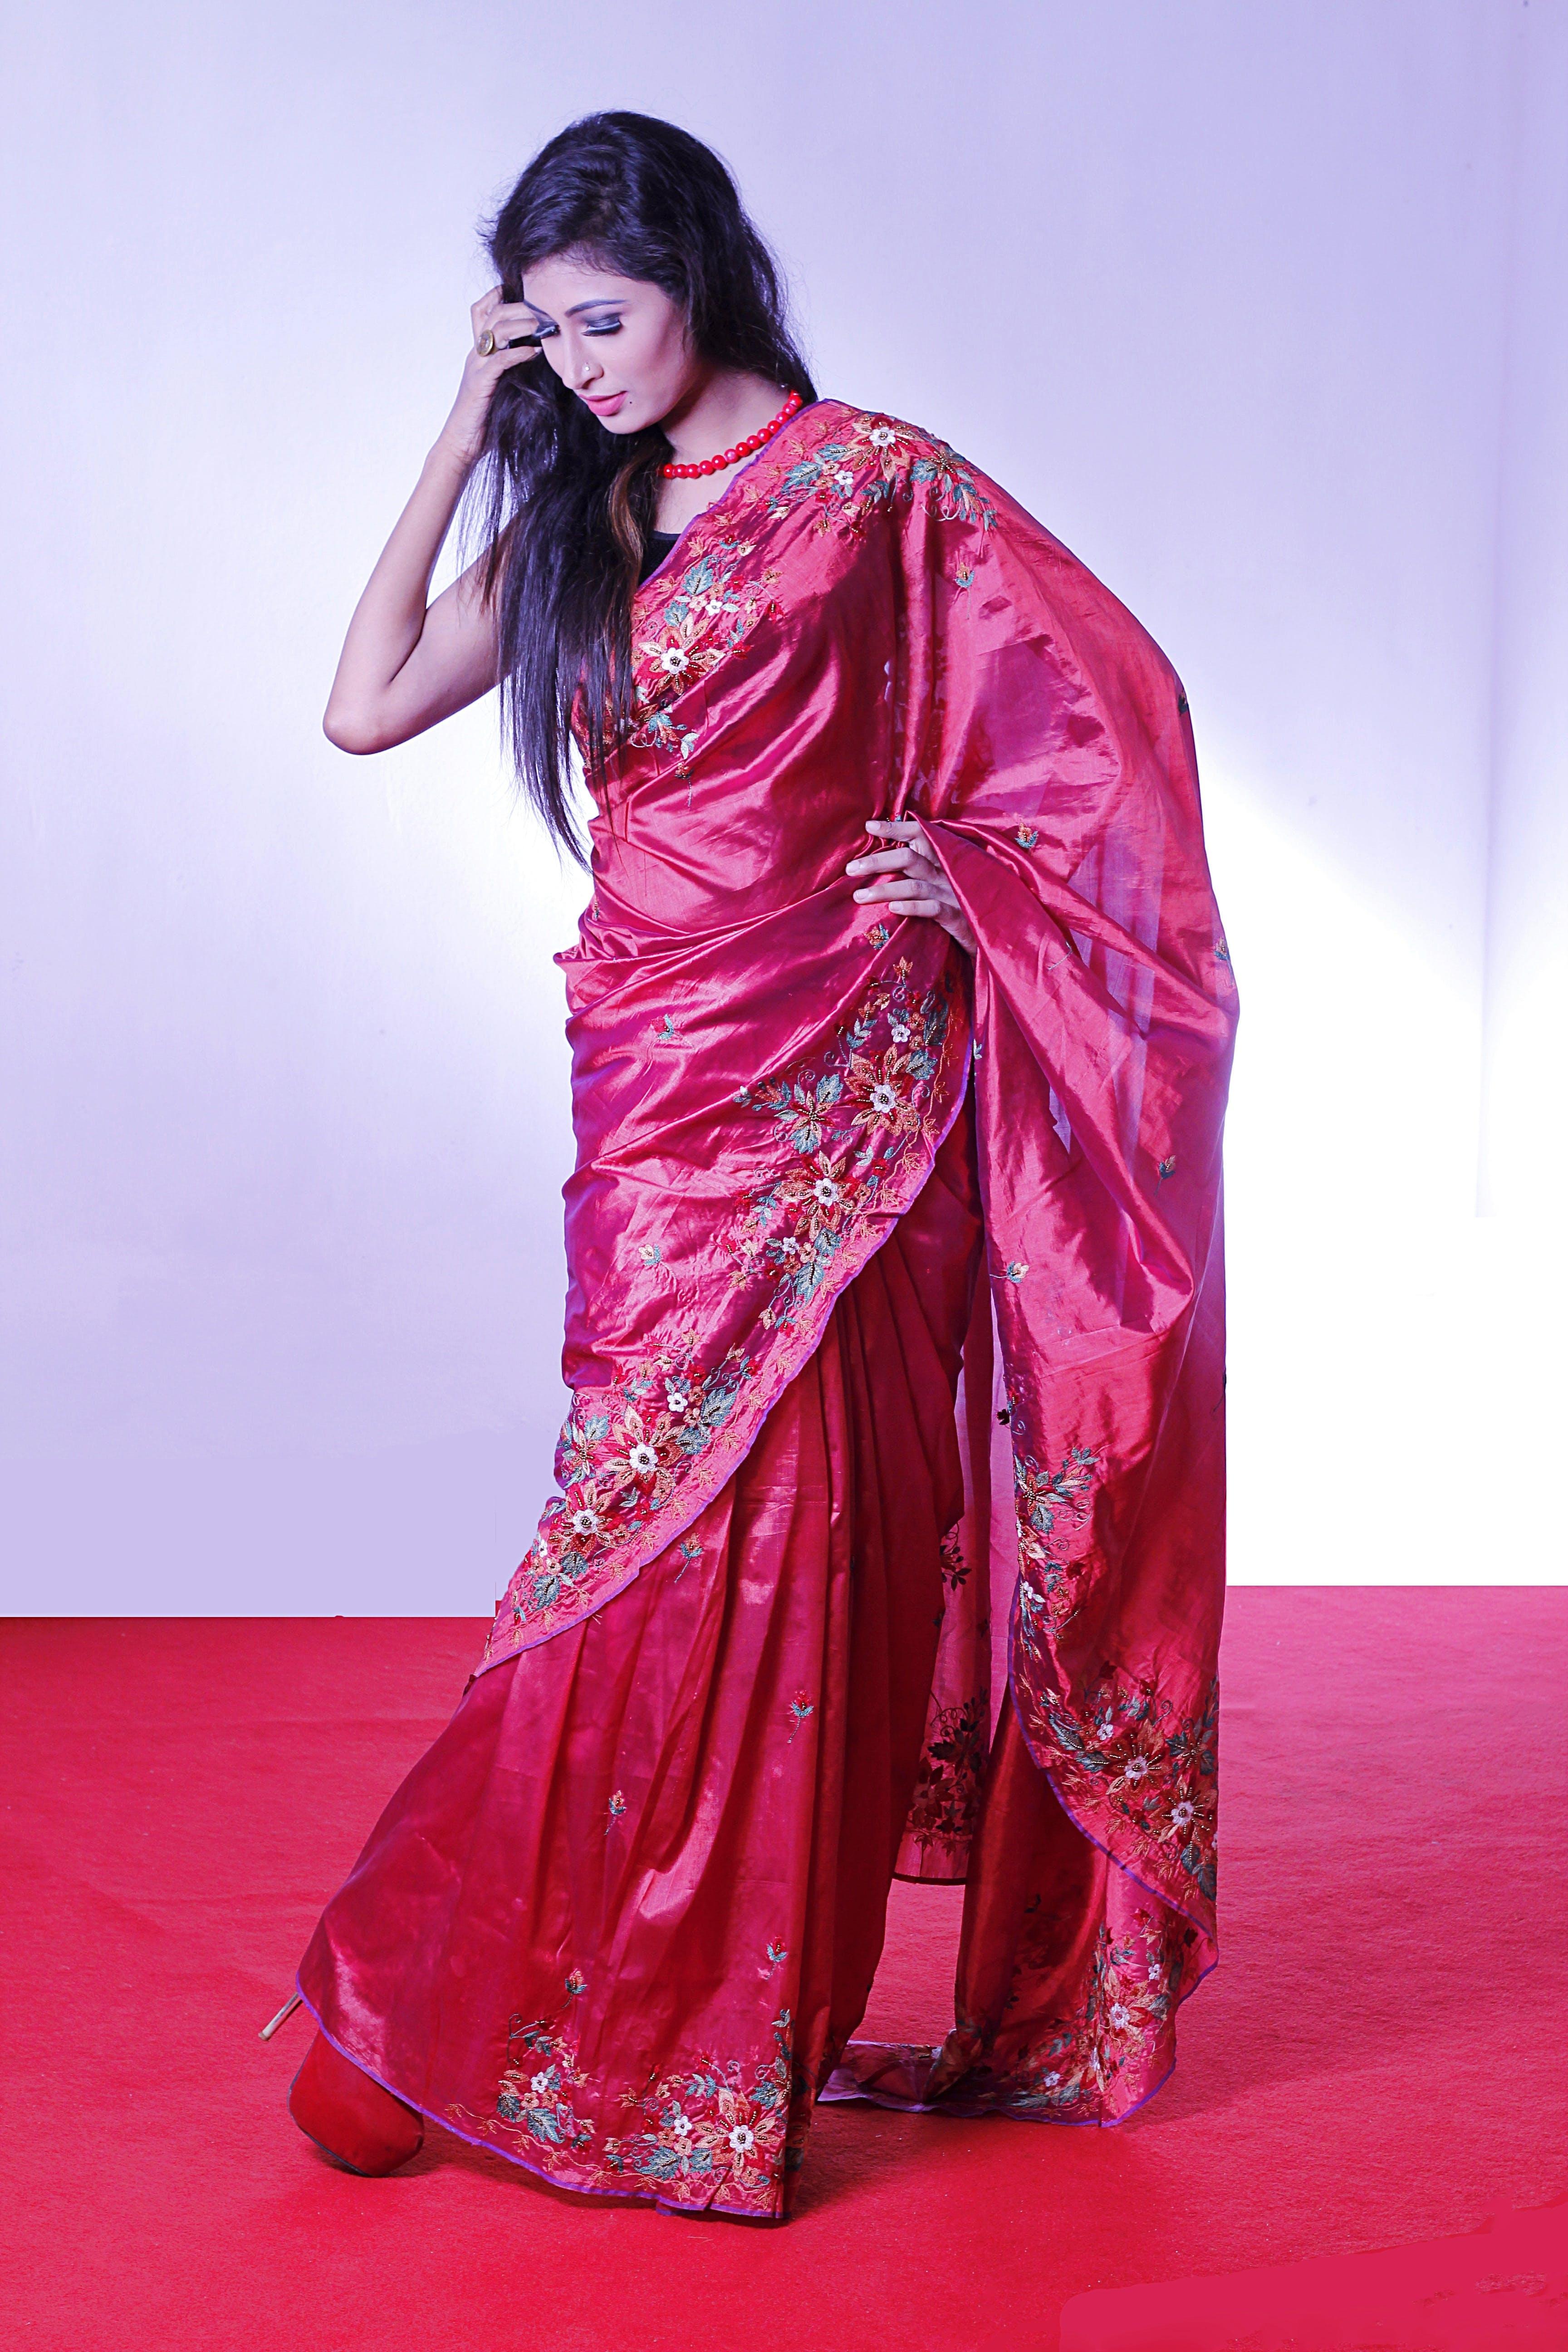 Free stock photo of fashion, women, model, young